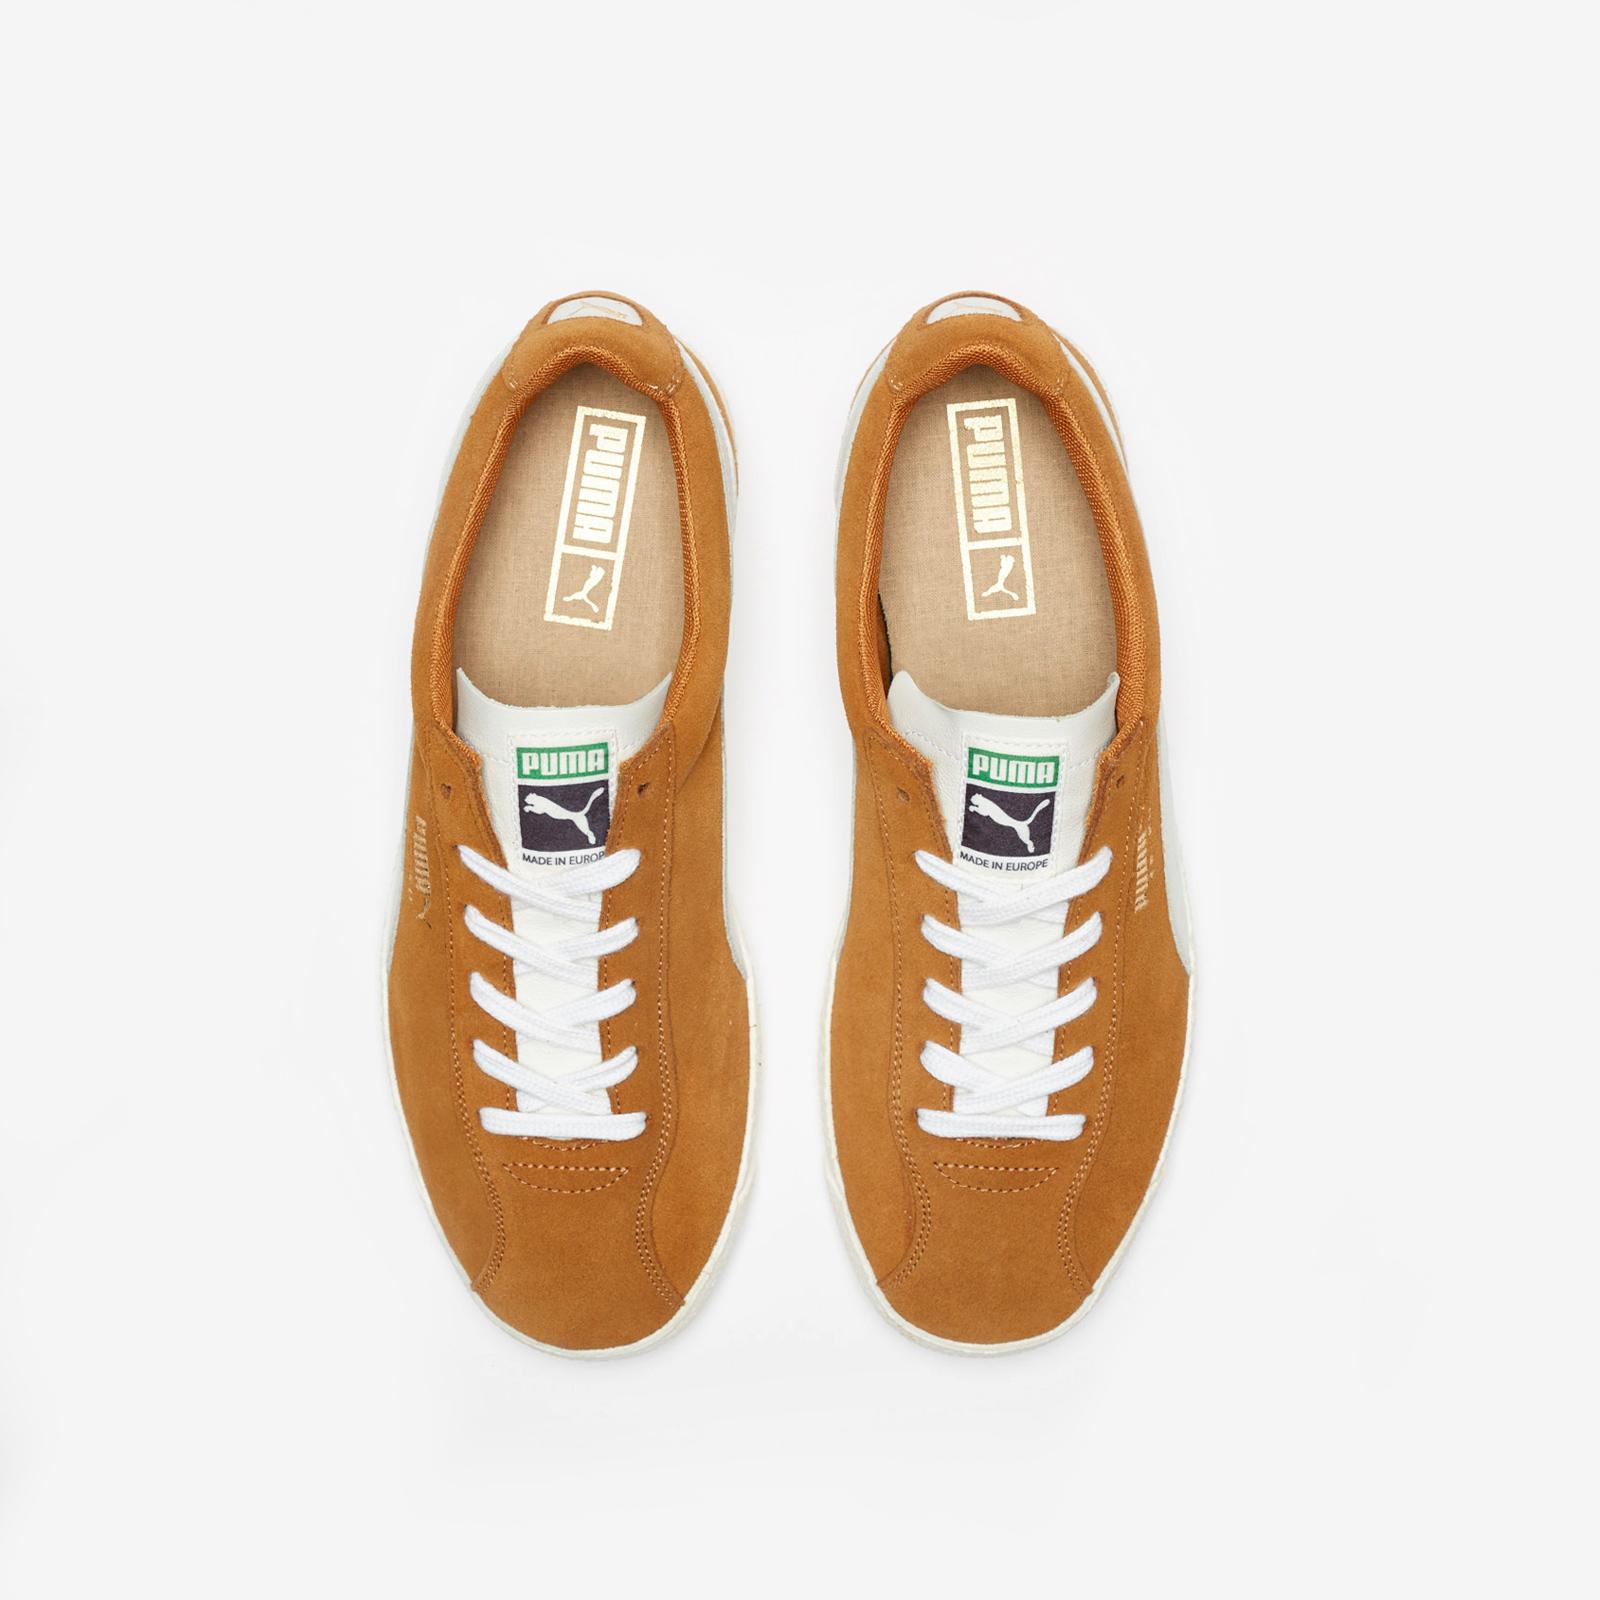 906b8954a4c Puma Te-Ku Prime - 366679-03 - Sneakersnstuff